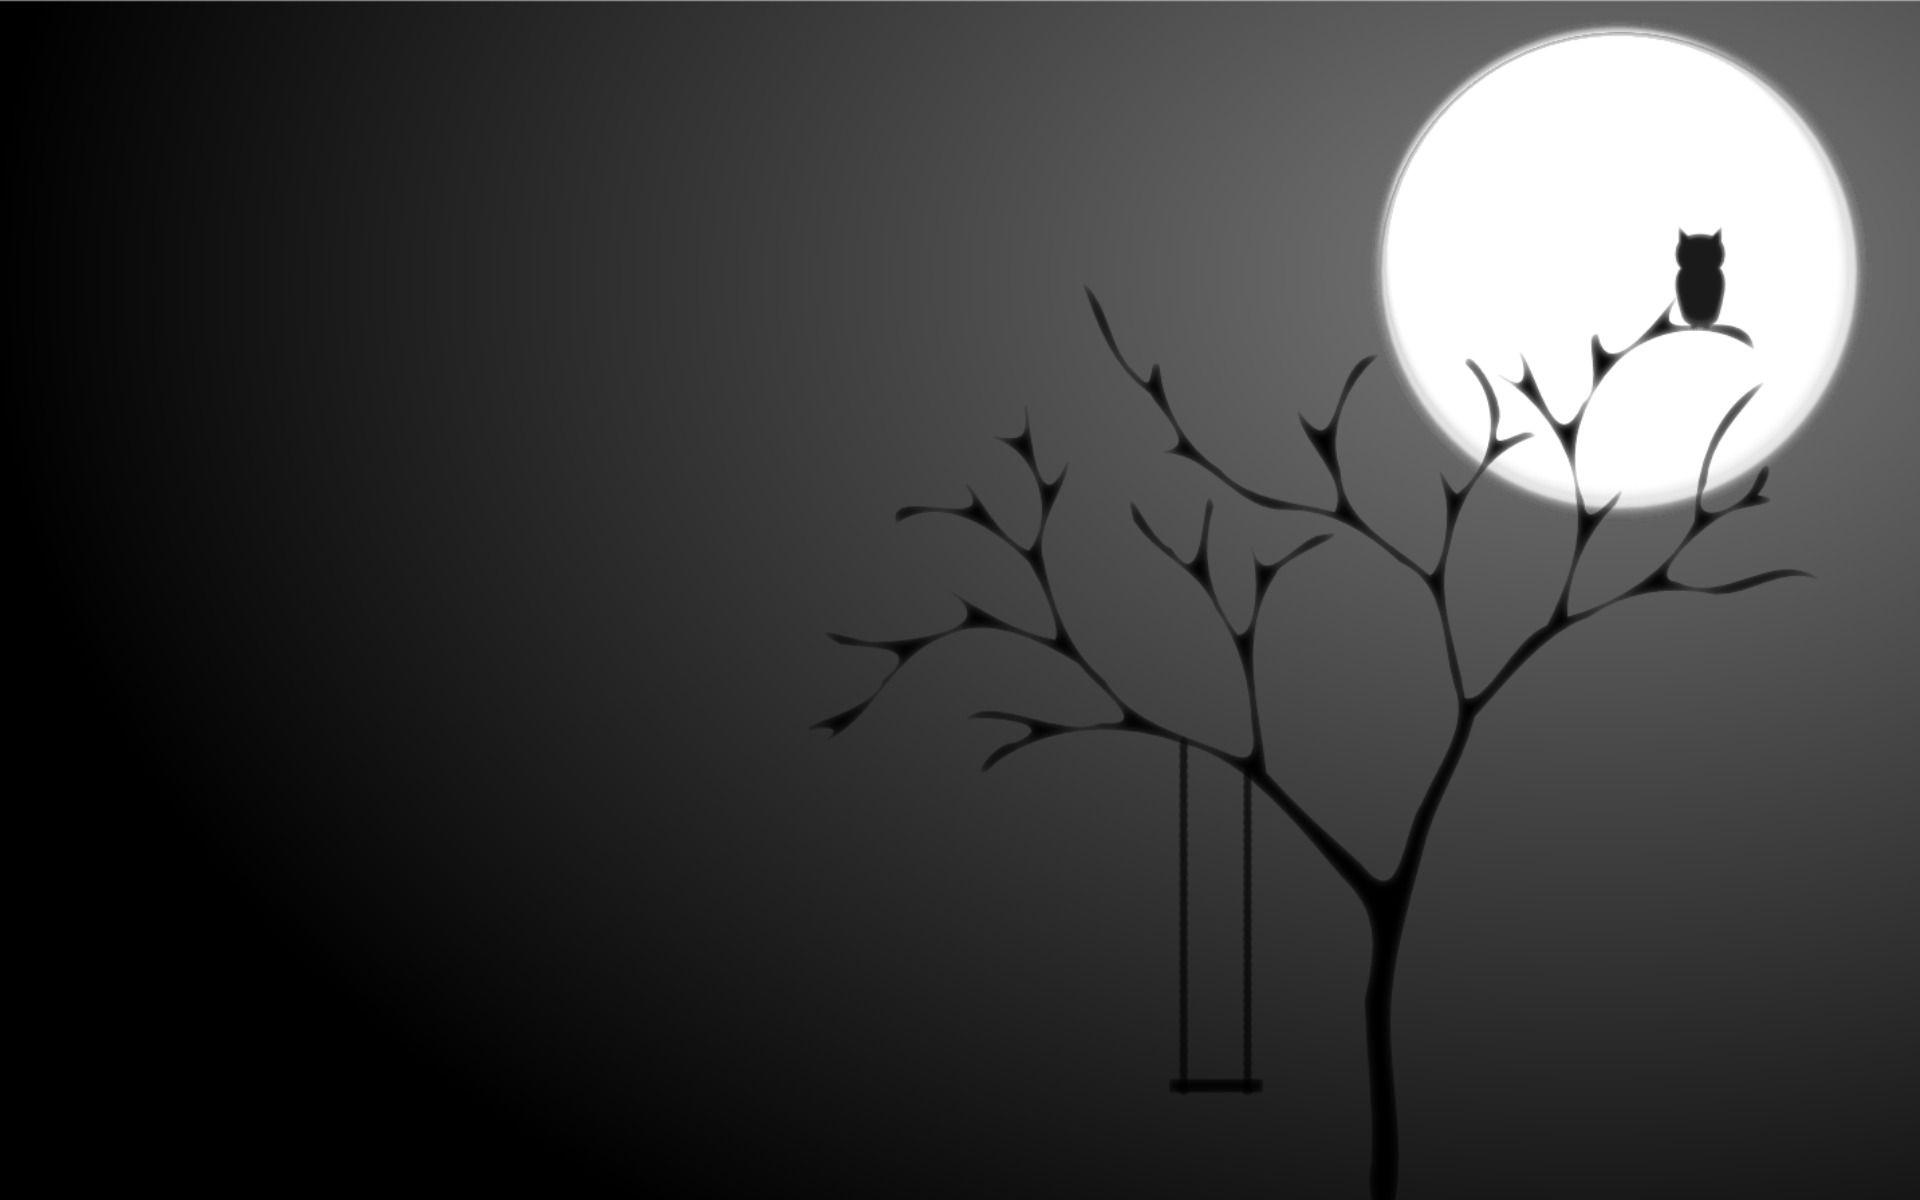 Night Owl Owl Background Black Hd Wallpaper Owl Wallpaper